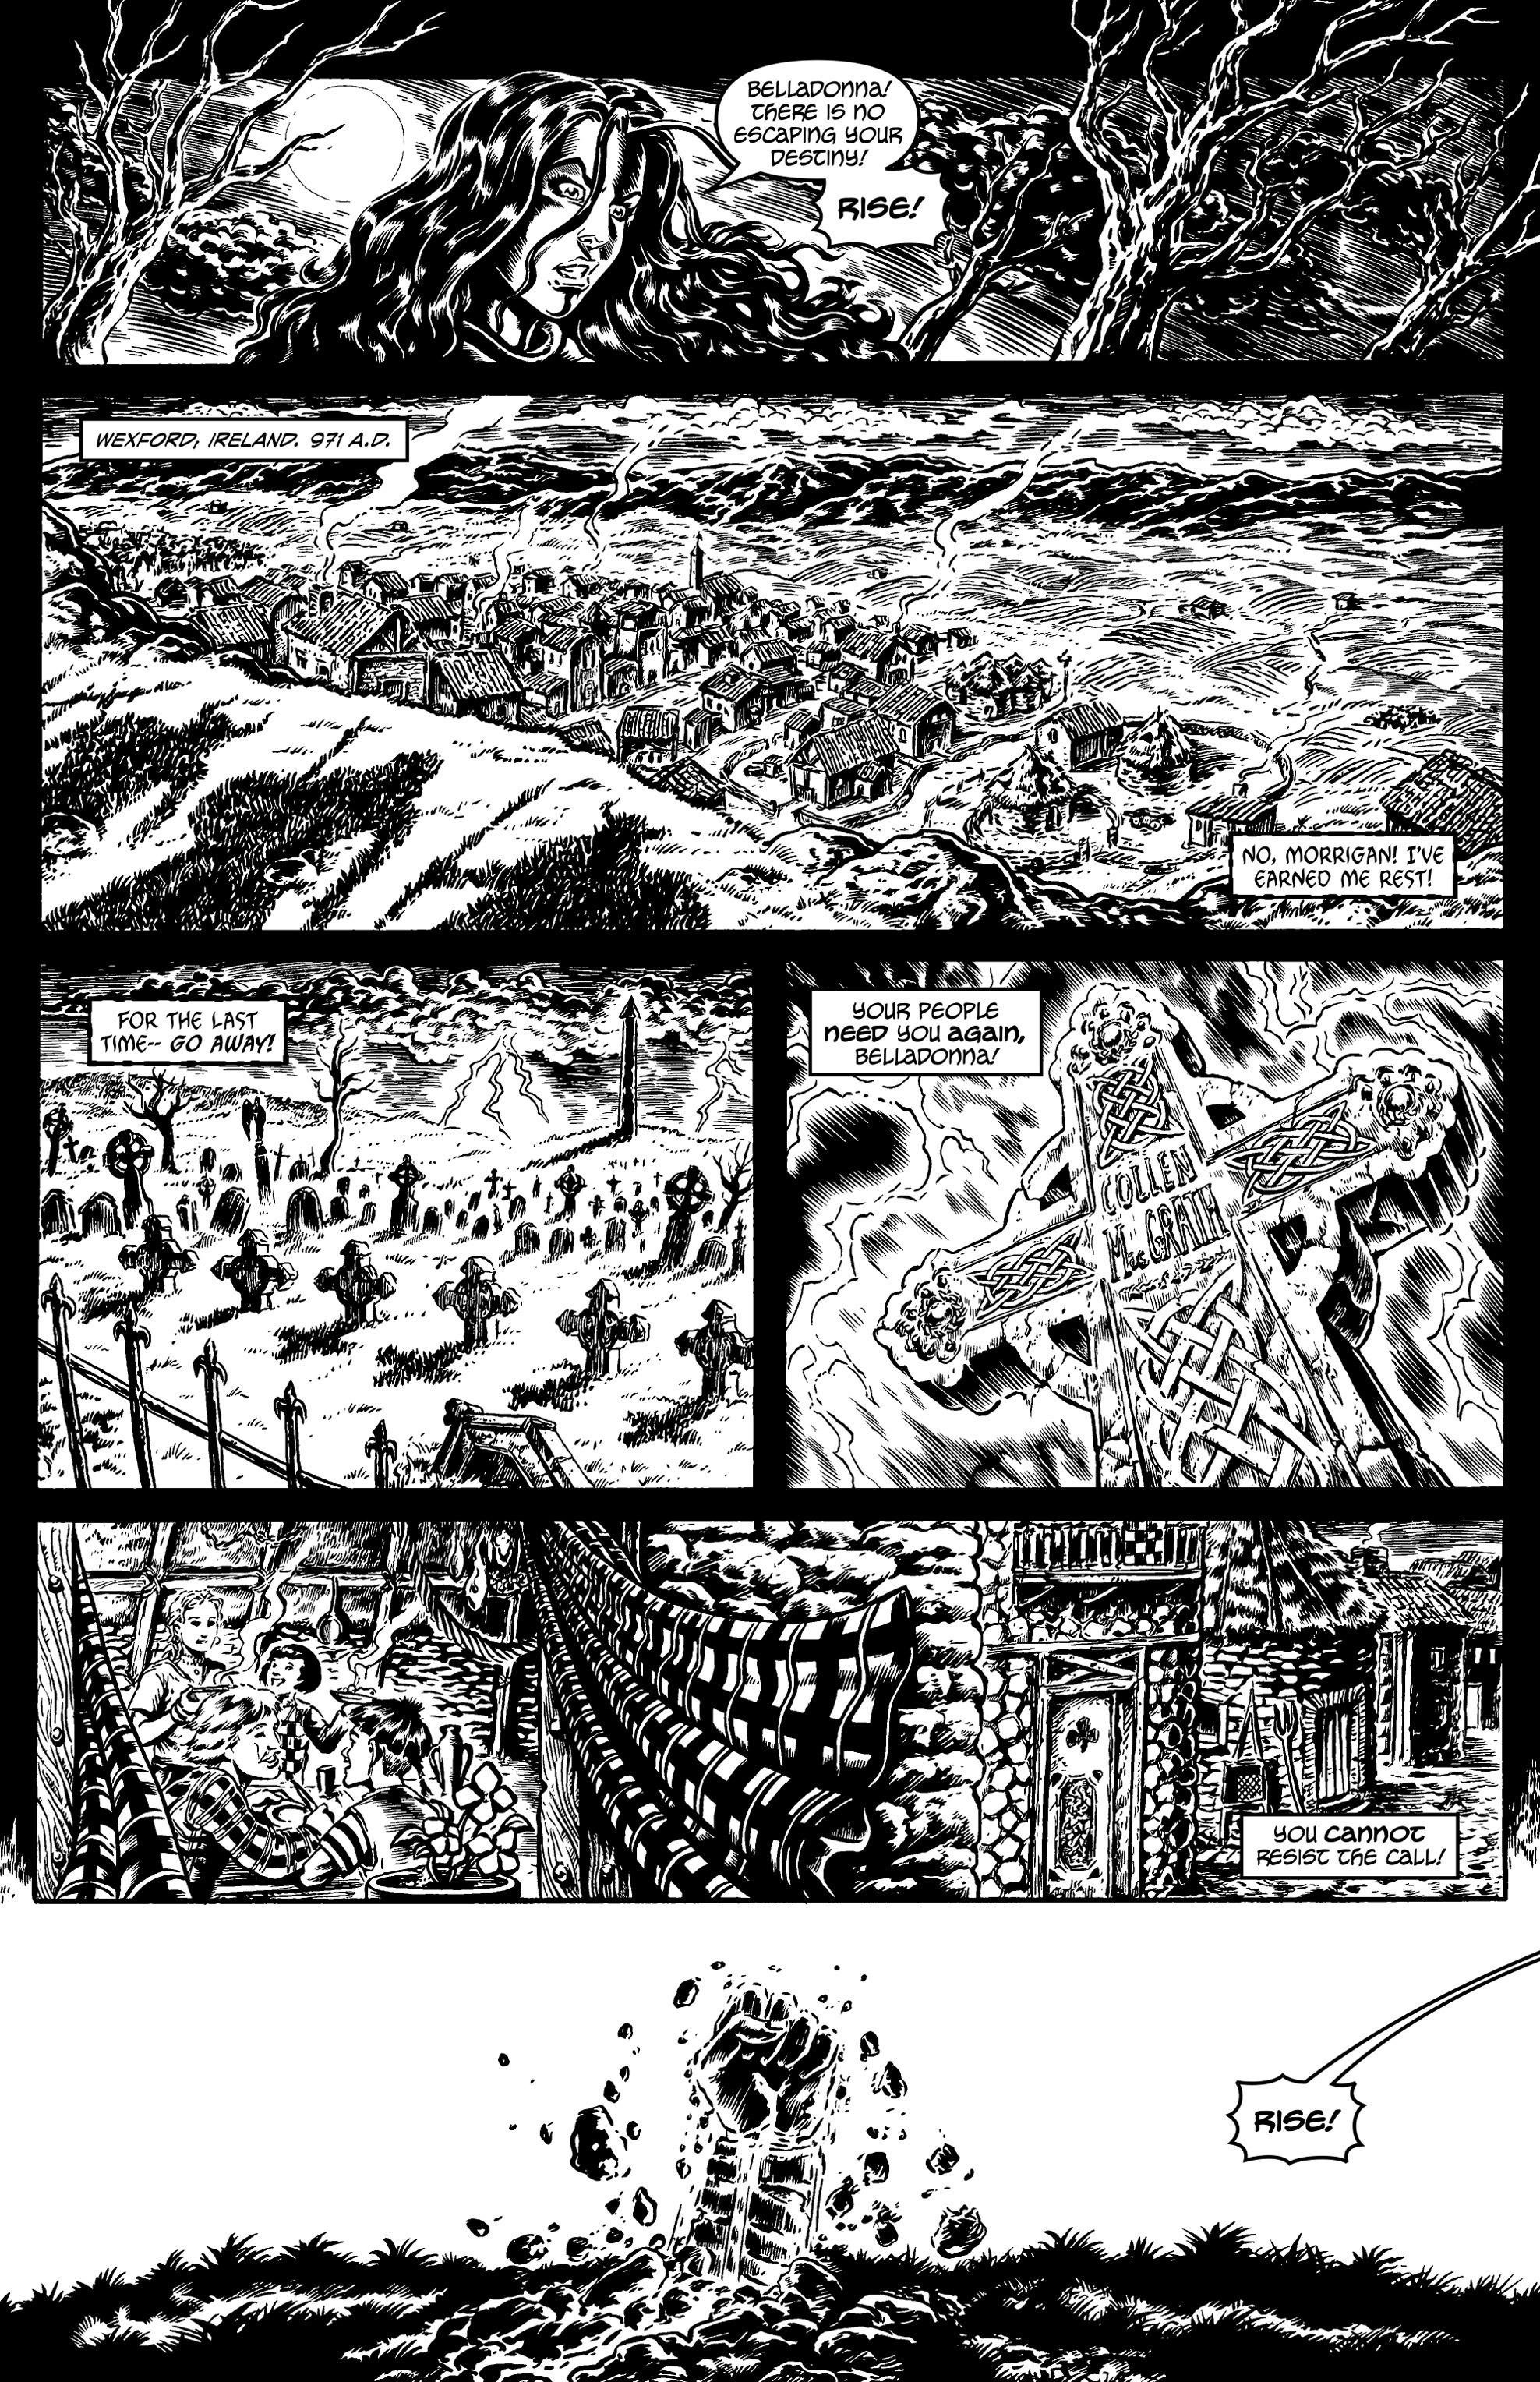 Read online Belladonna: Origins comic -  Issue #1 - 13